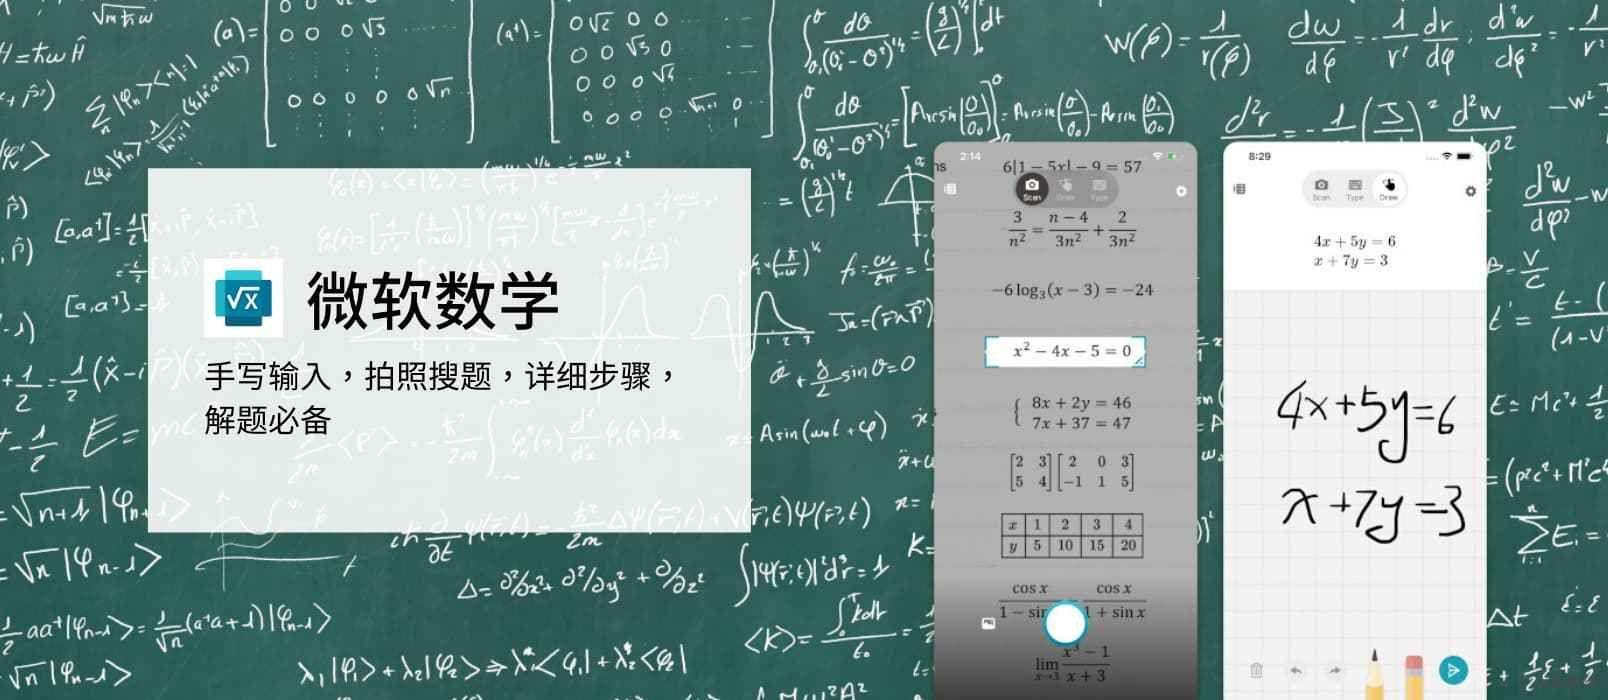 5e7cbc1007493 - 《微软数学》 iPhone 与 Android 版:拍照解题